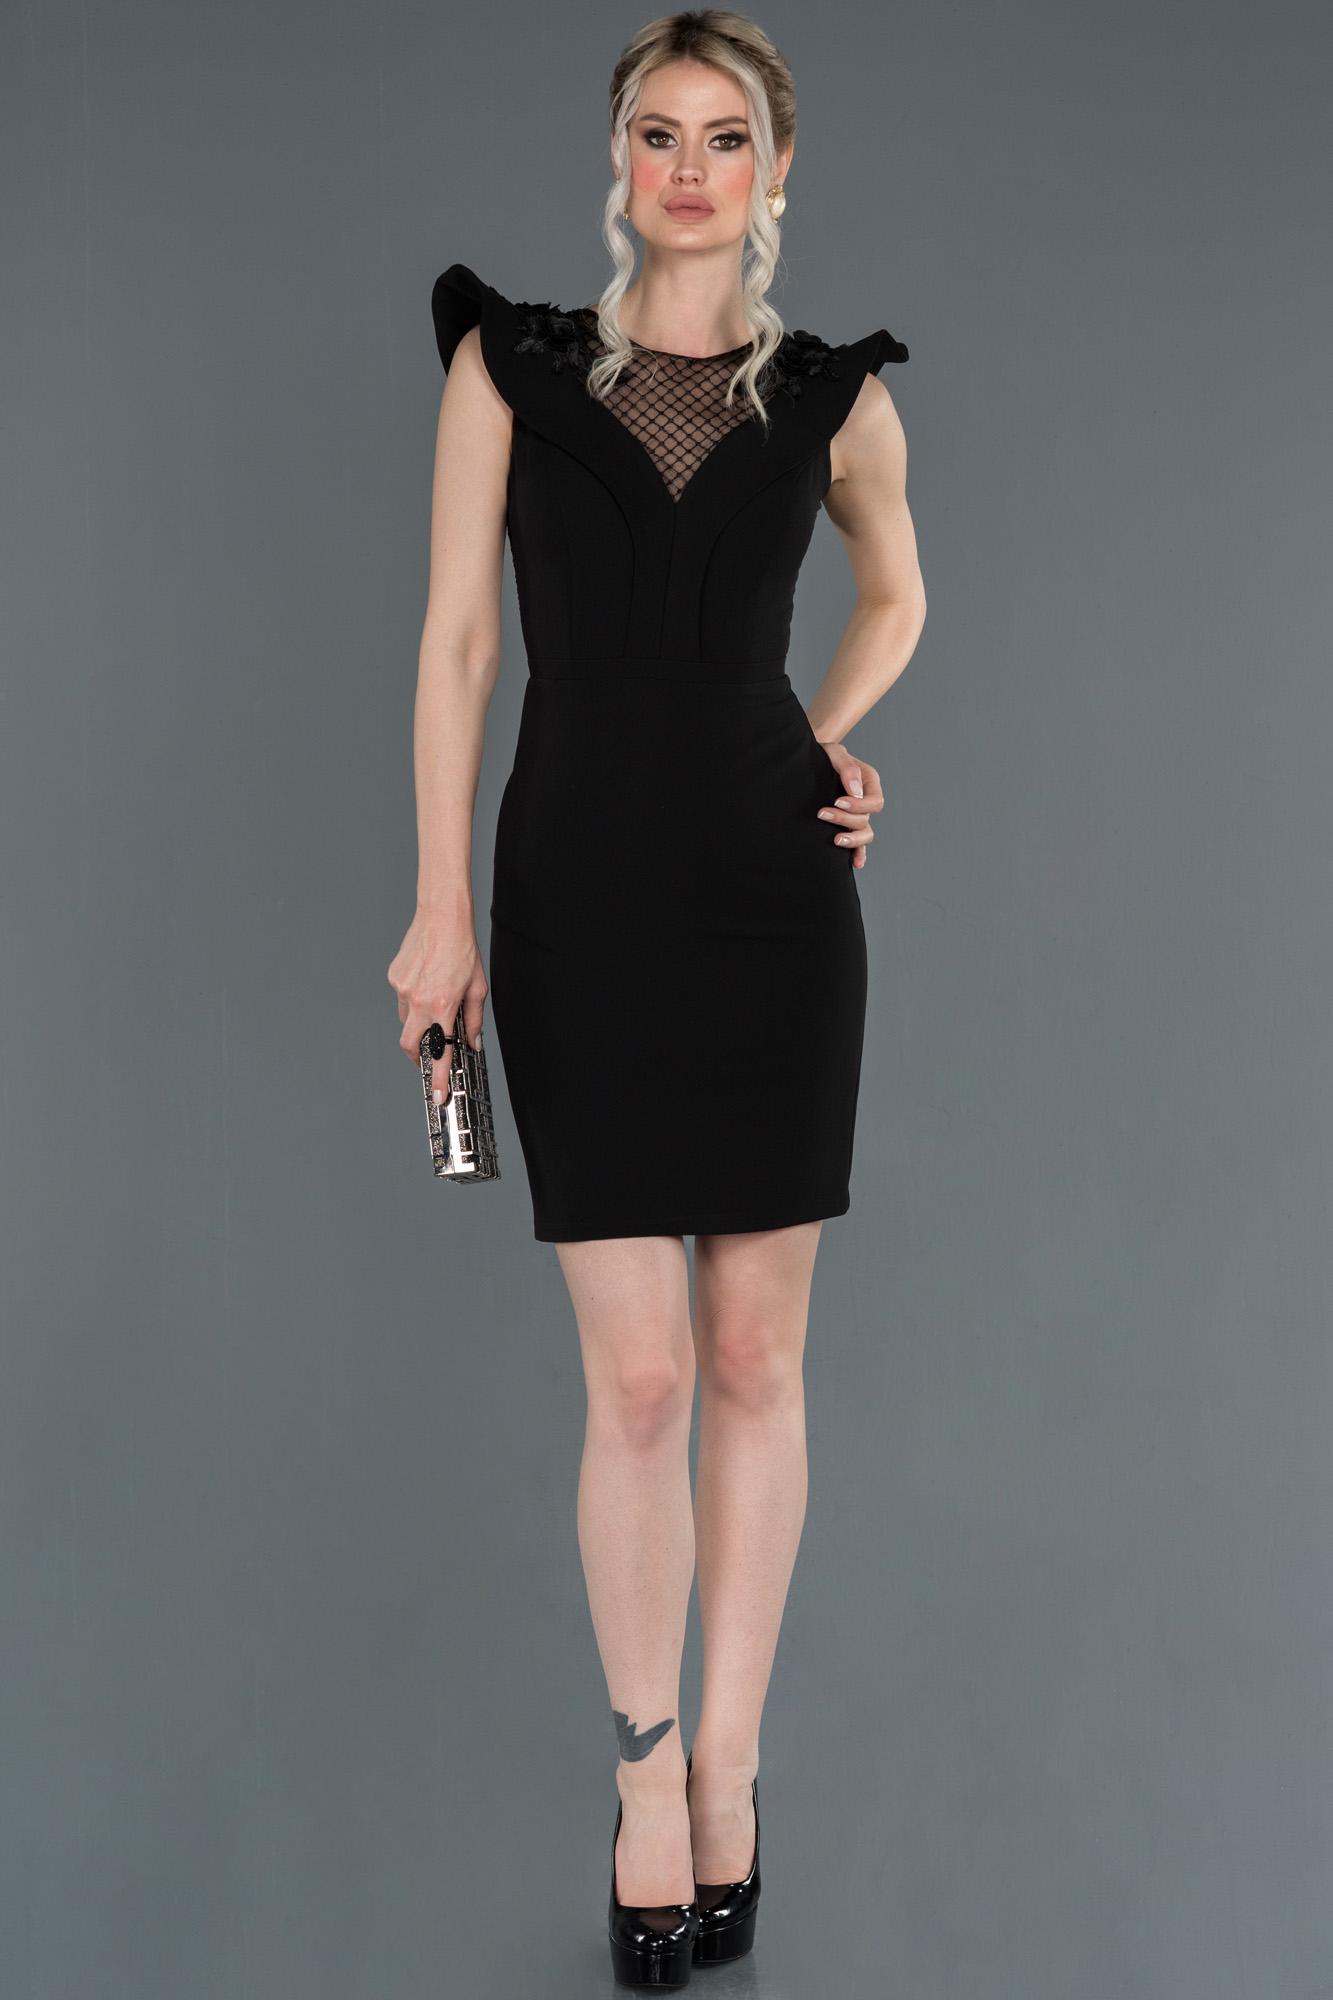 Siyah Kol Detaylı Davet Elbisesi